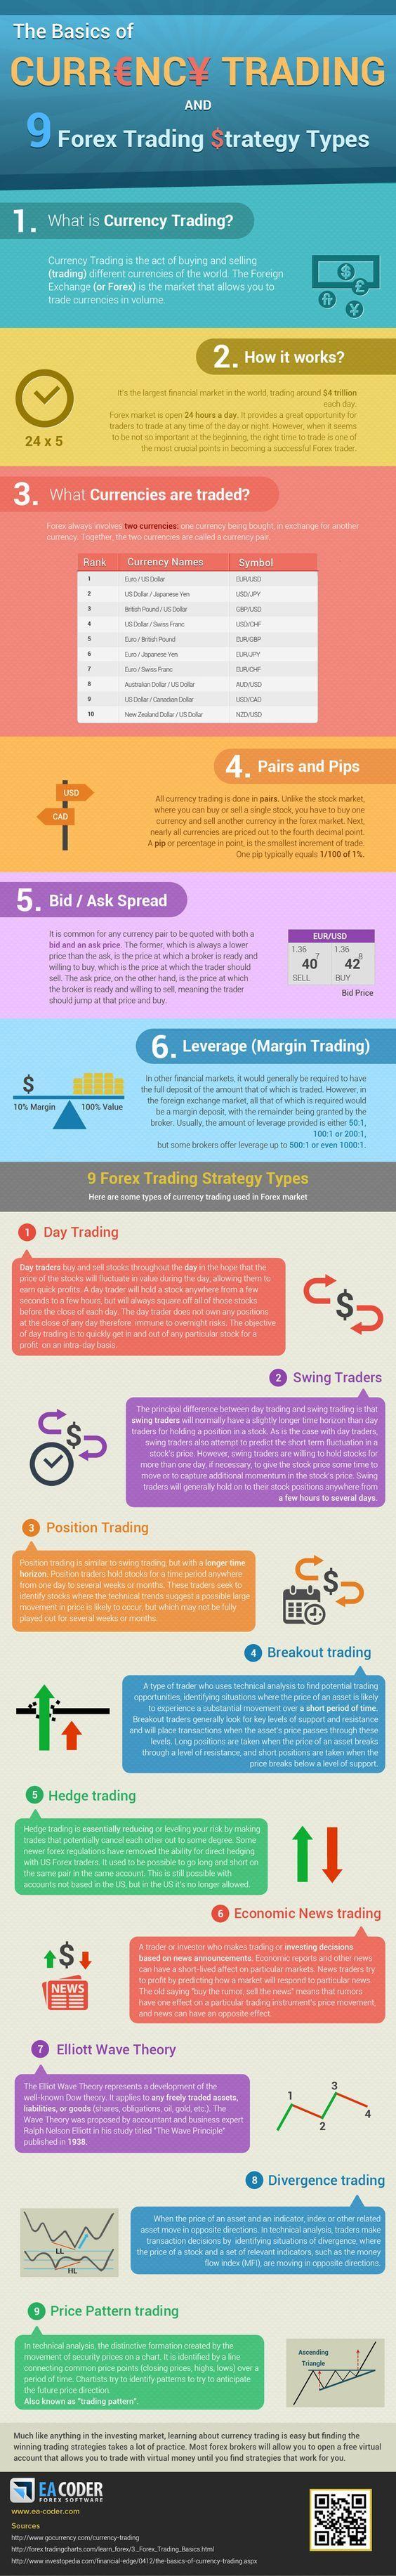 Trading strategies source